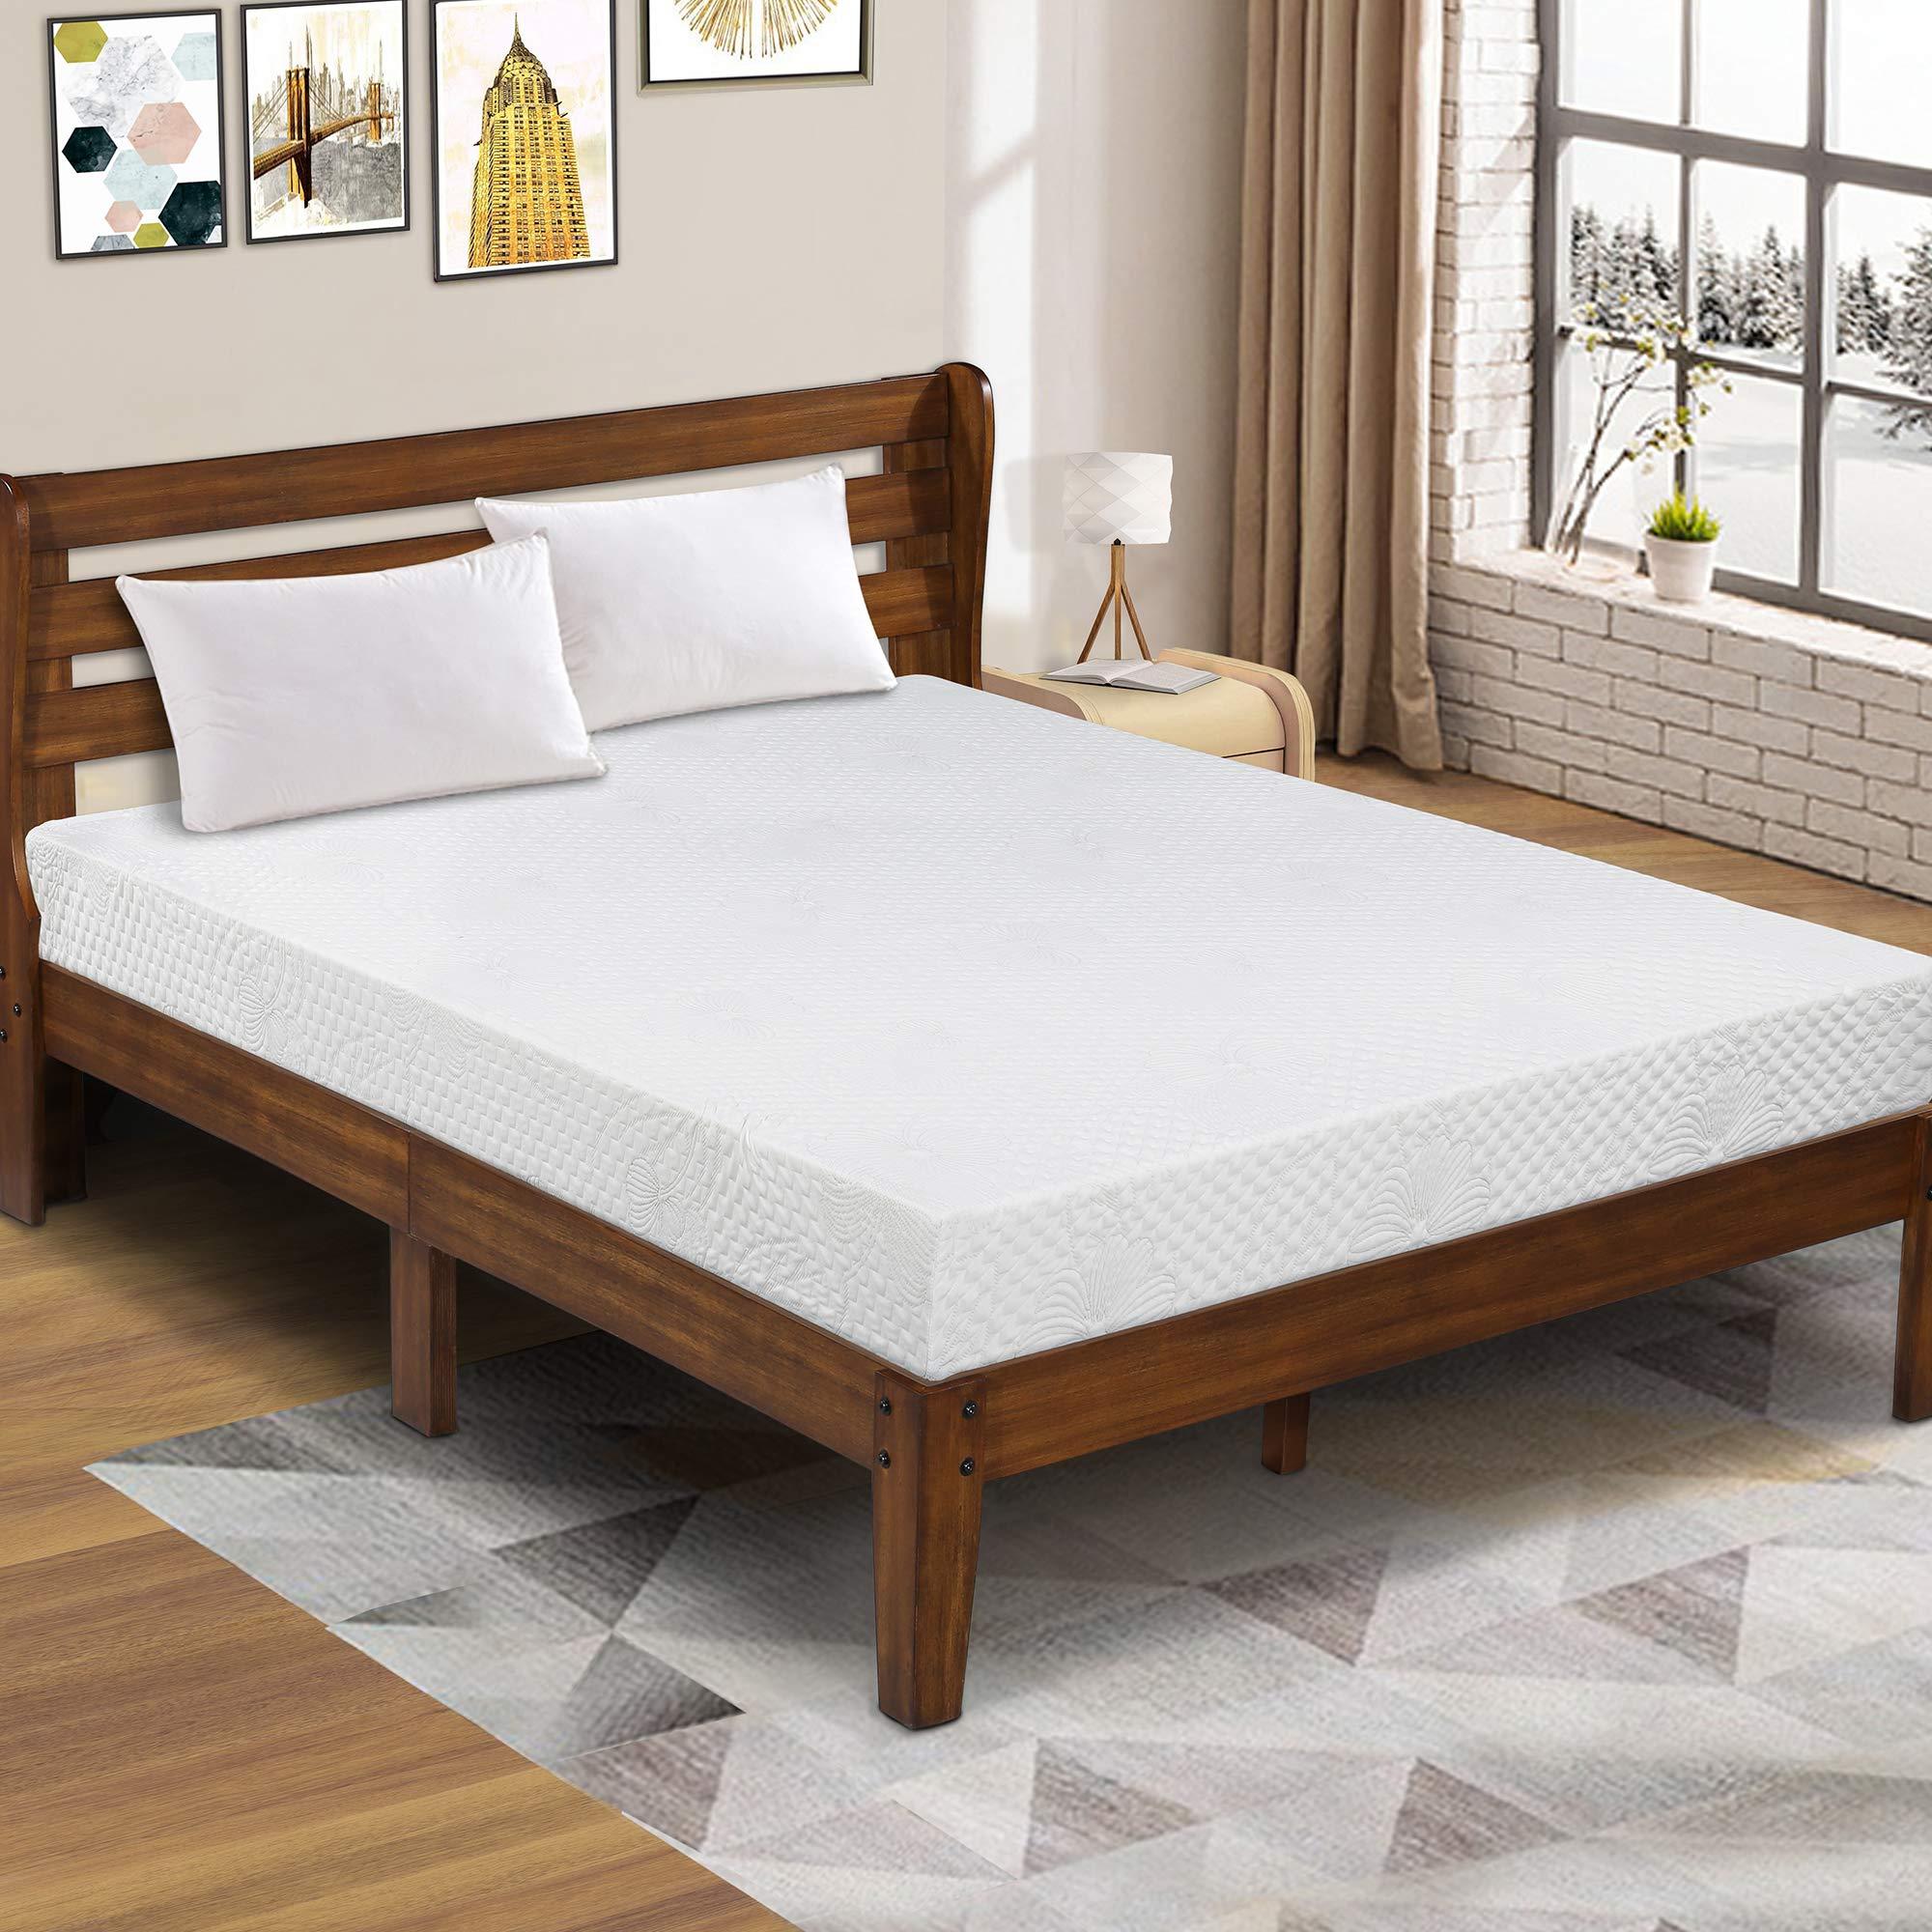 Olee Sleep 5 Inch Gel Adaptive Comfort Memory Foam Mattress 05FM04 (Twin) by Olee Sleep